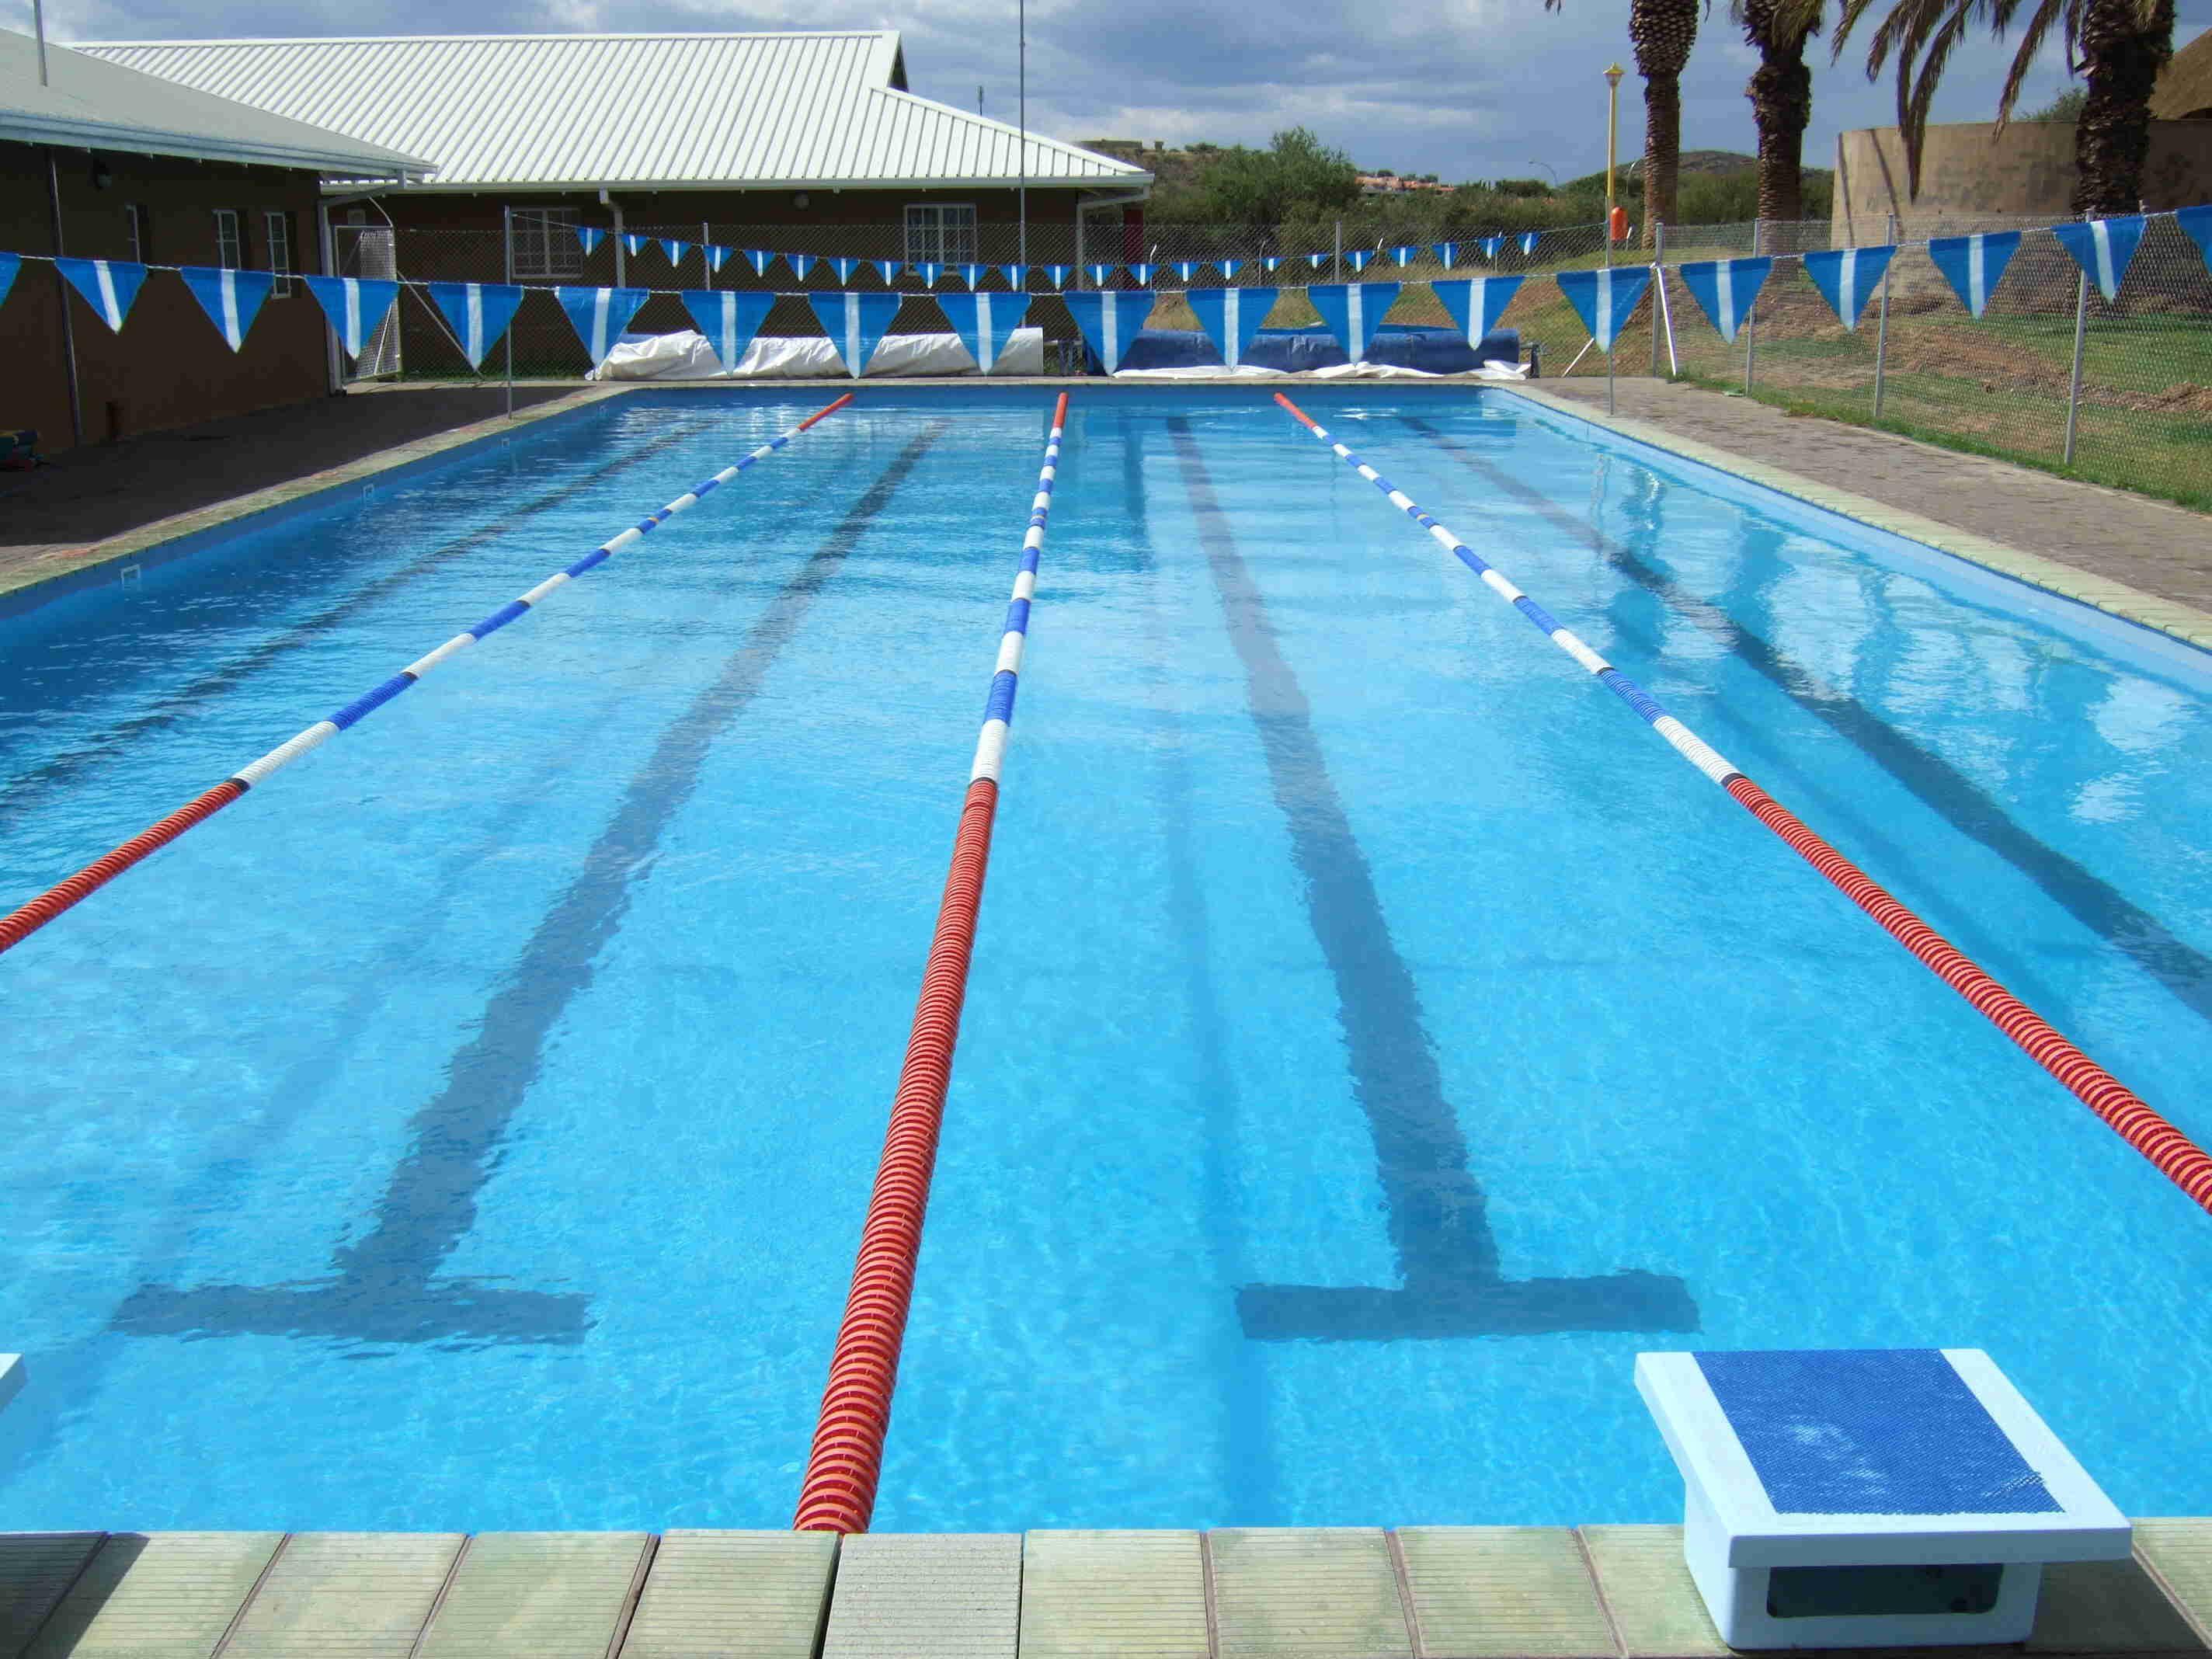 Diy training pool diy swimming pools luxury swimming for Pool design course